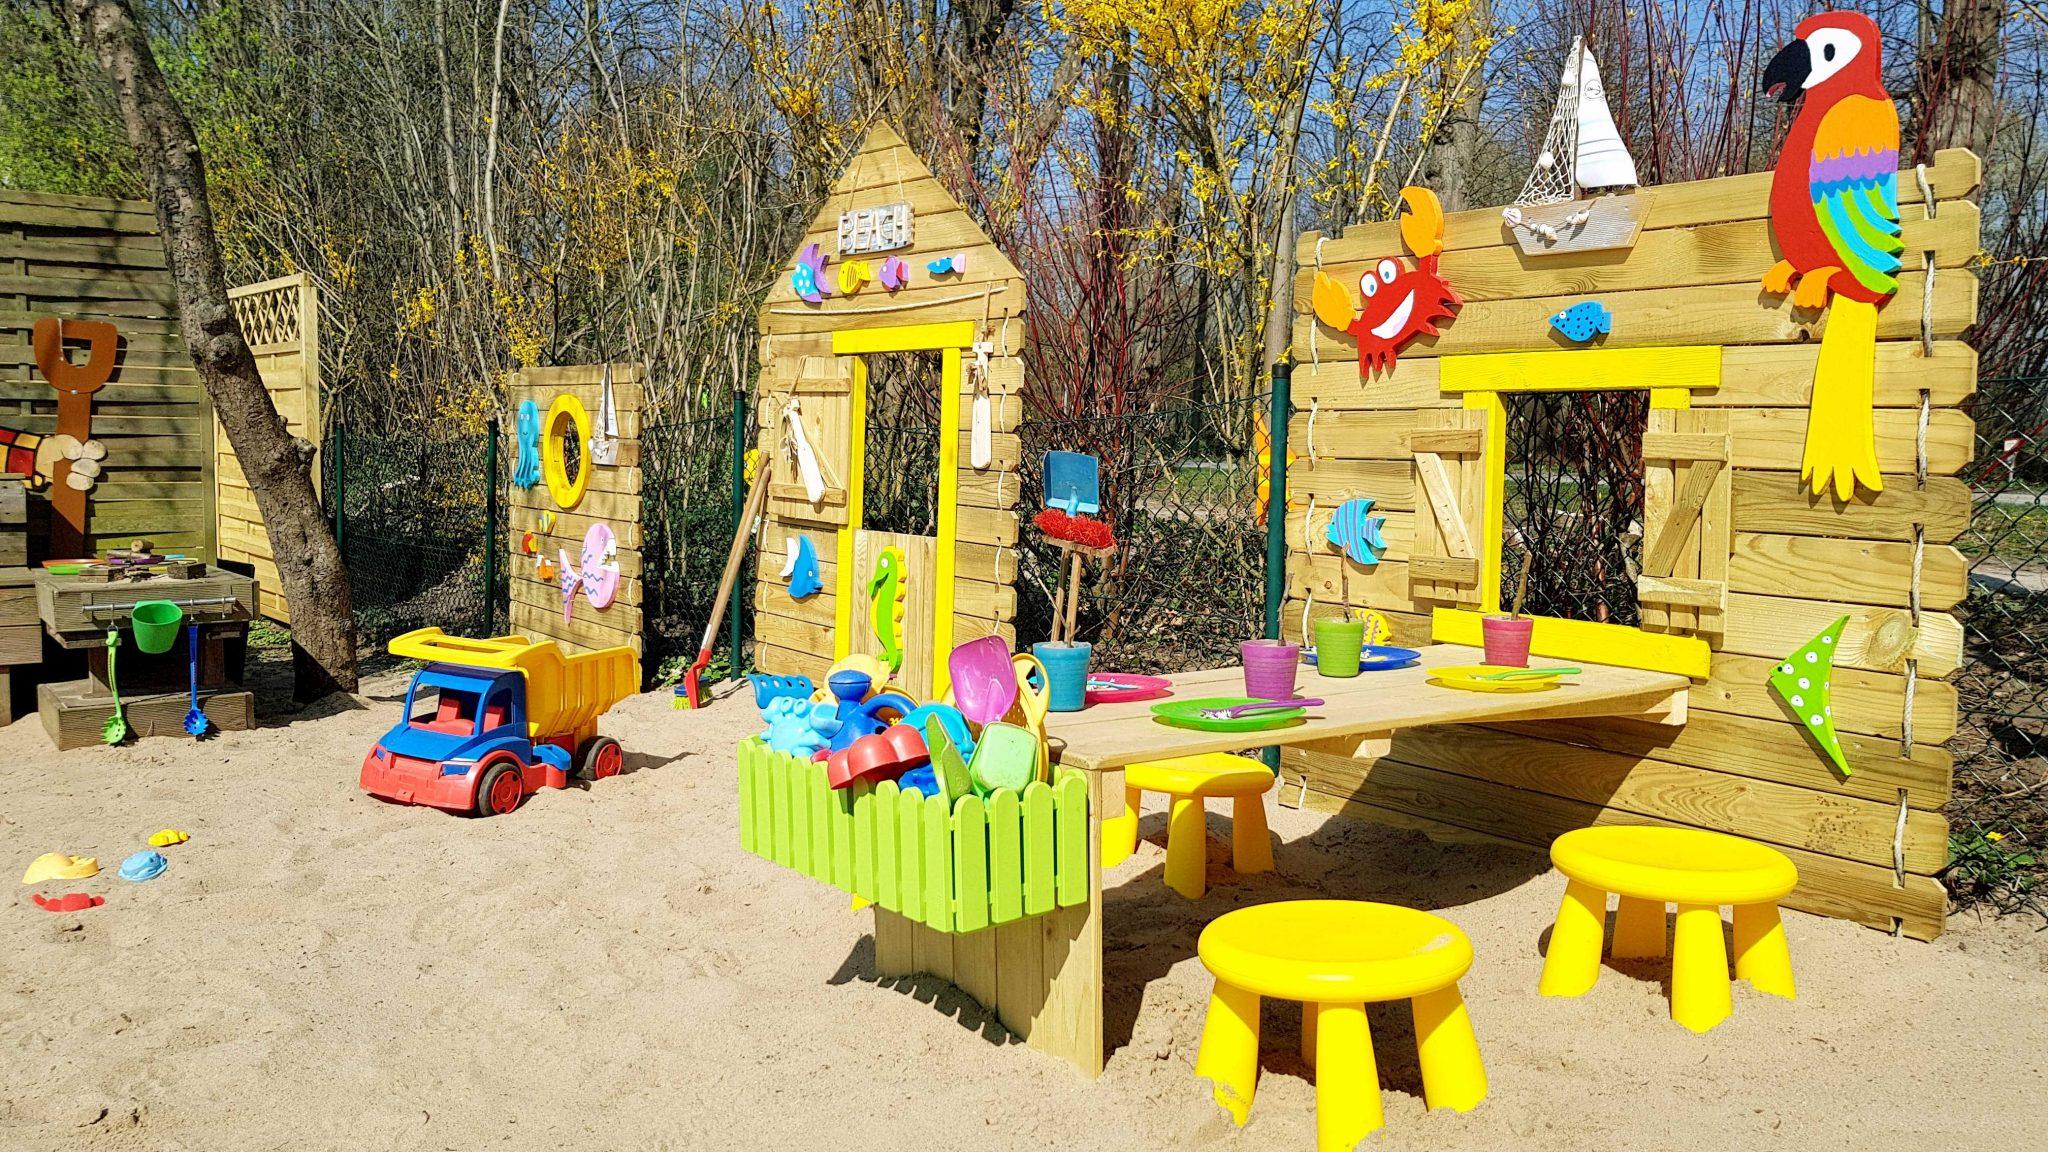 Kita Kid Zone Kinderbetreuung Garten1 25 - Kinder-Beachclub